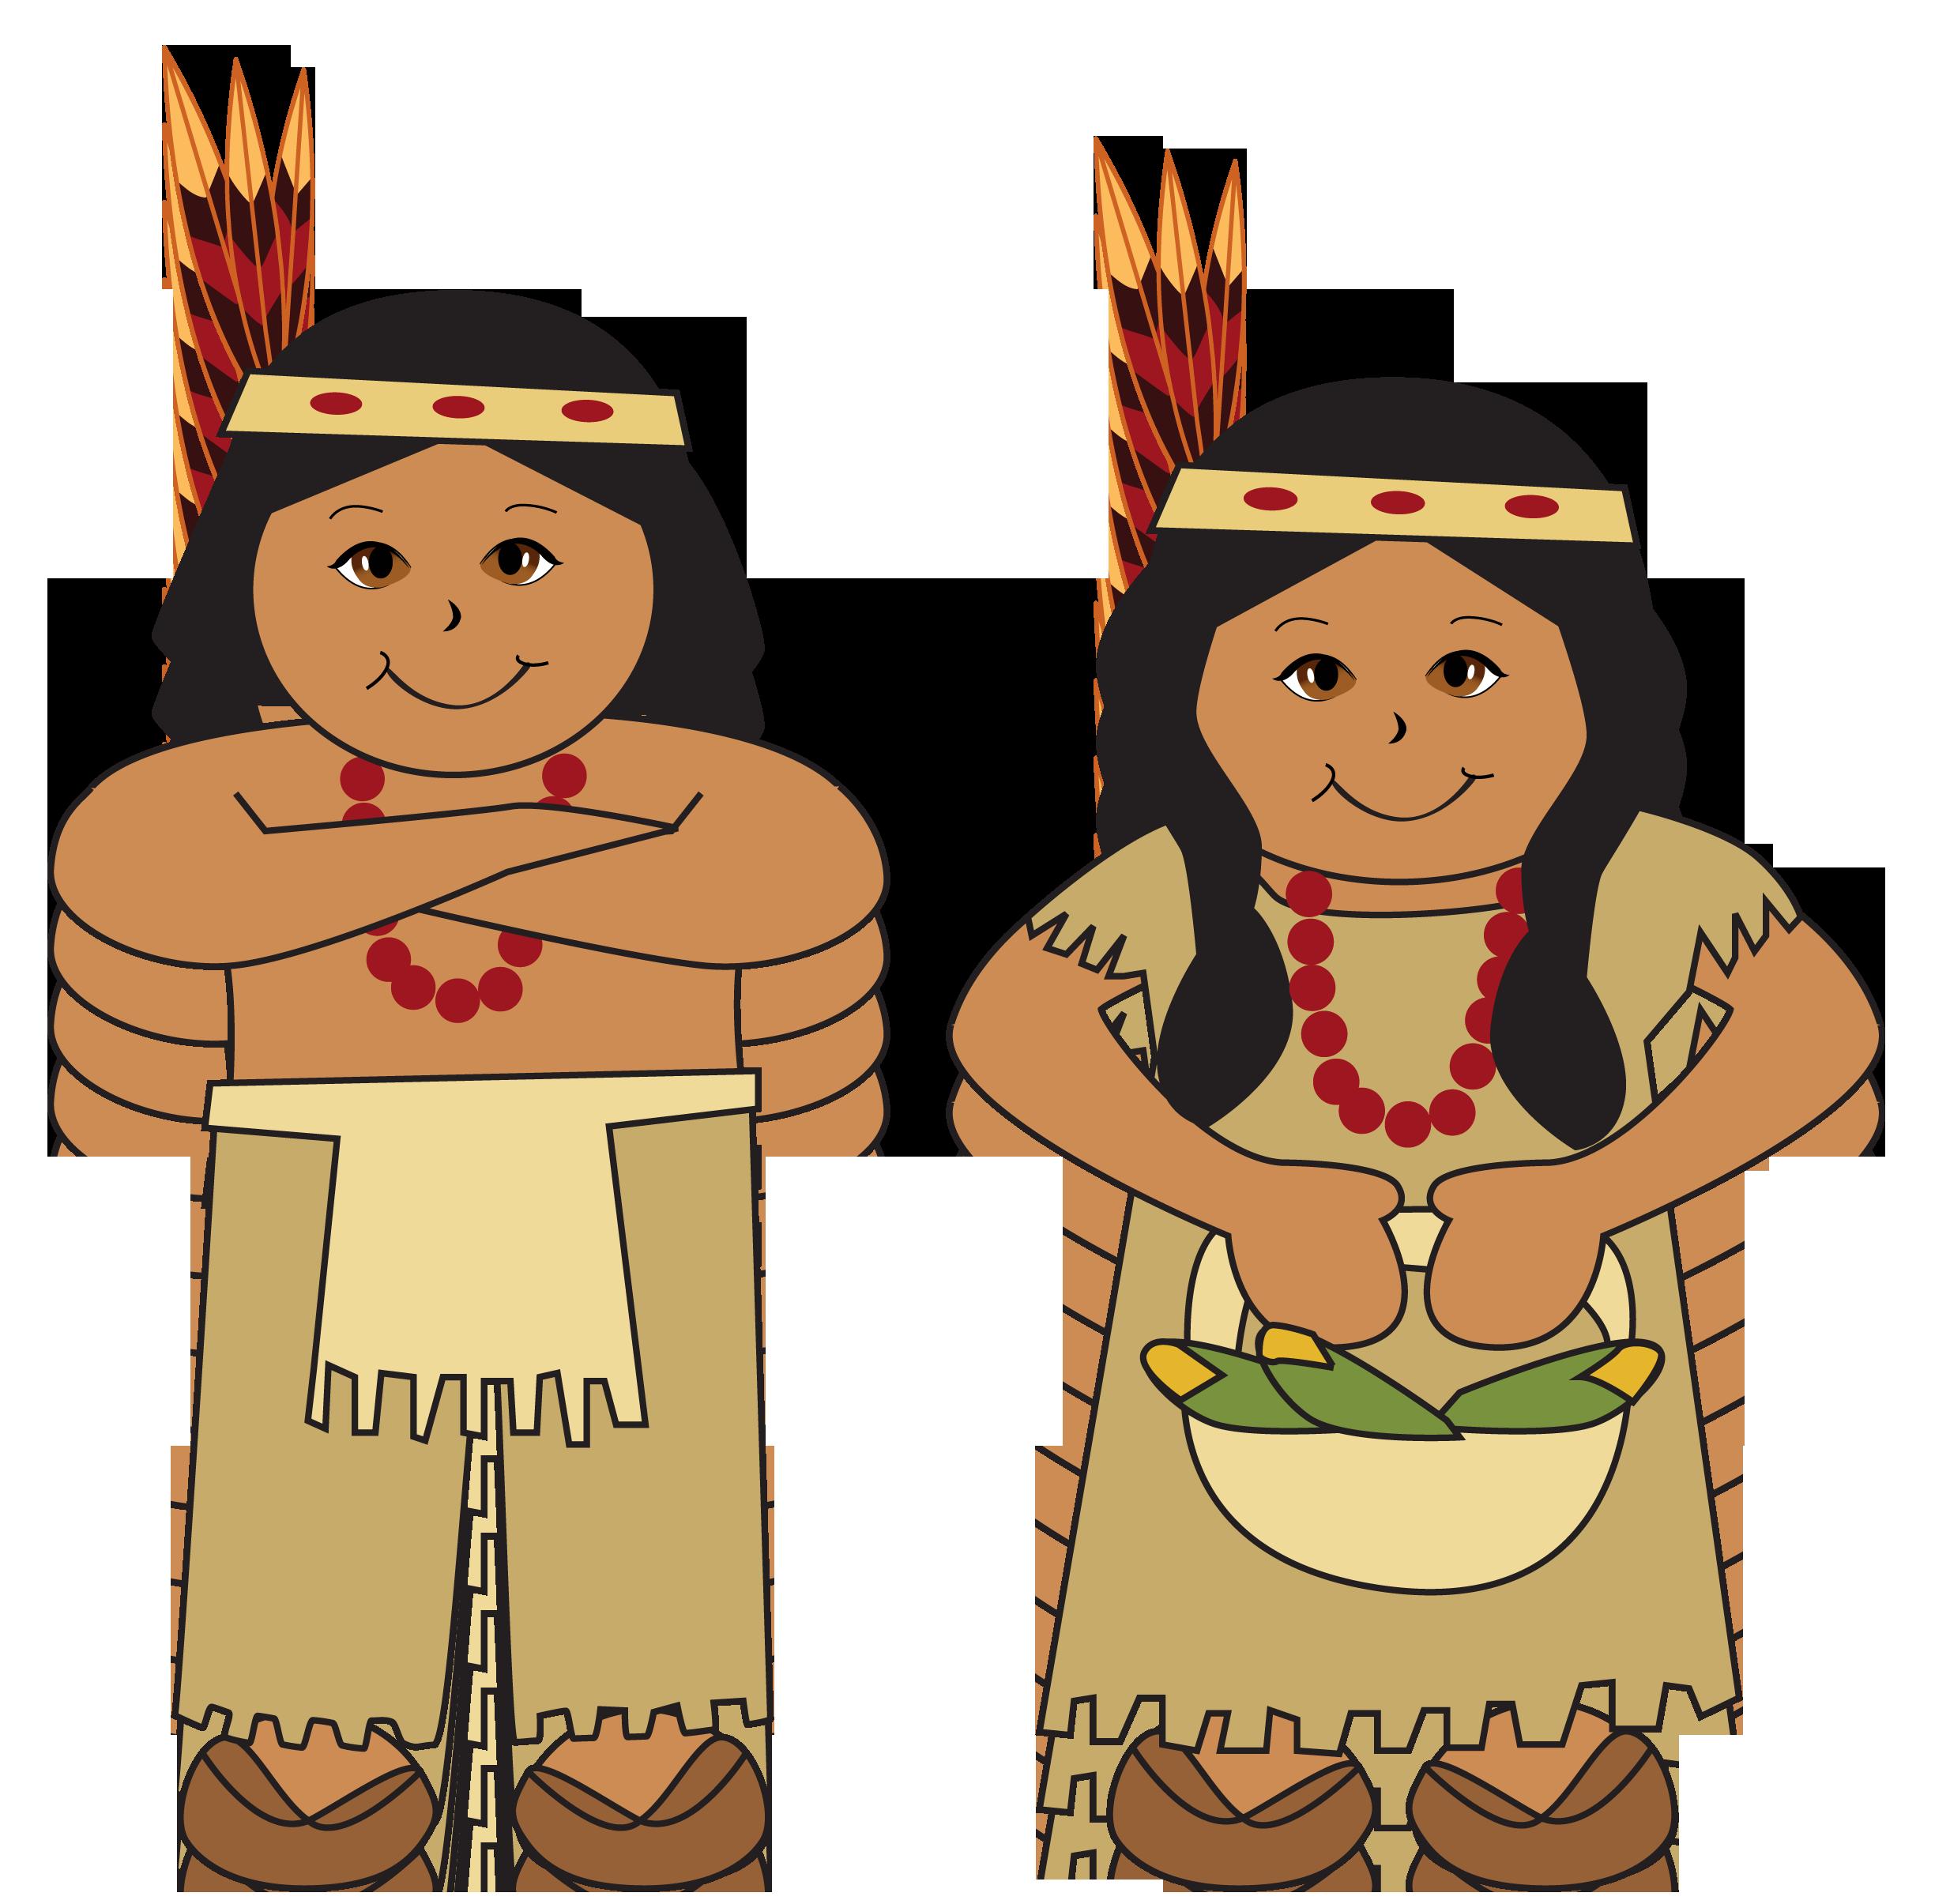 pilgrim and indian clipart at getdrawings com free for personal rh getdrawings com pilgrim and indian clipart free pilgrim and indian clipart